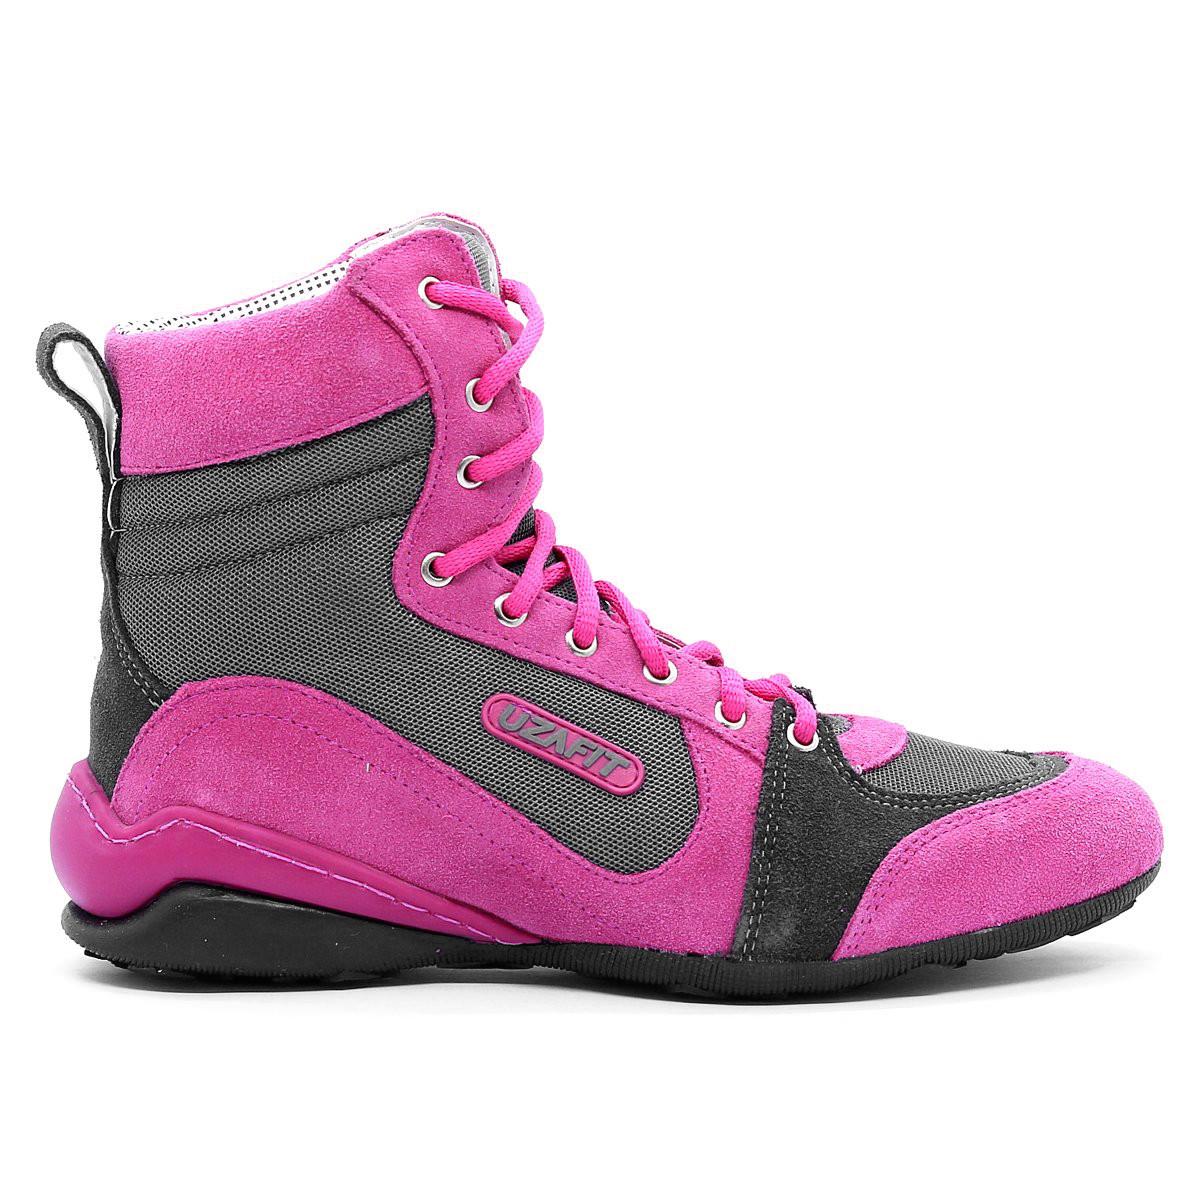 Uzafit Bota de Treino Dueto Pink Cinza DT20300